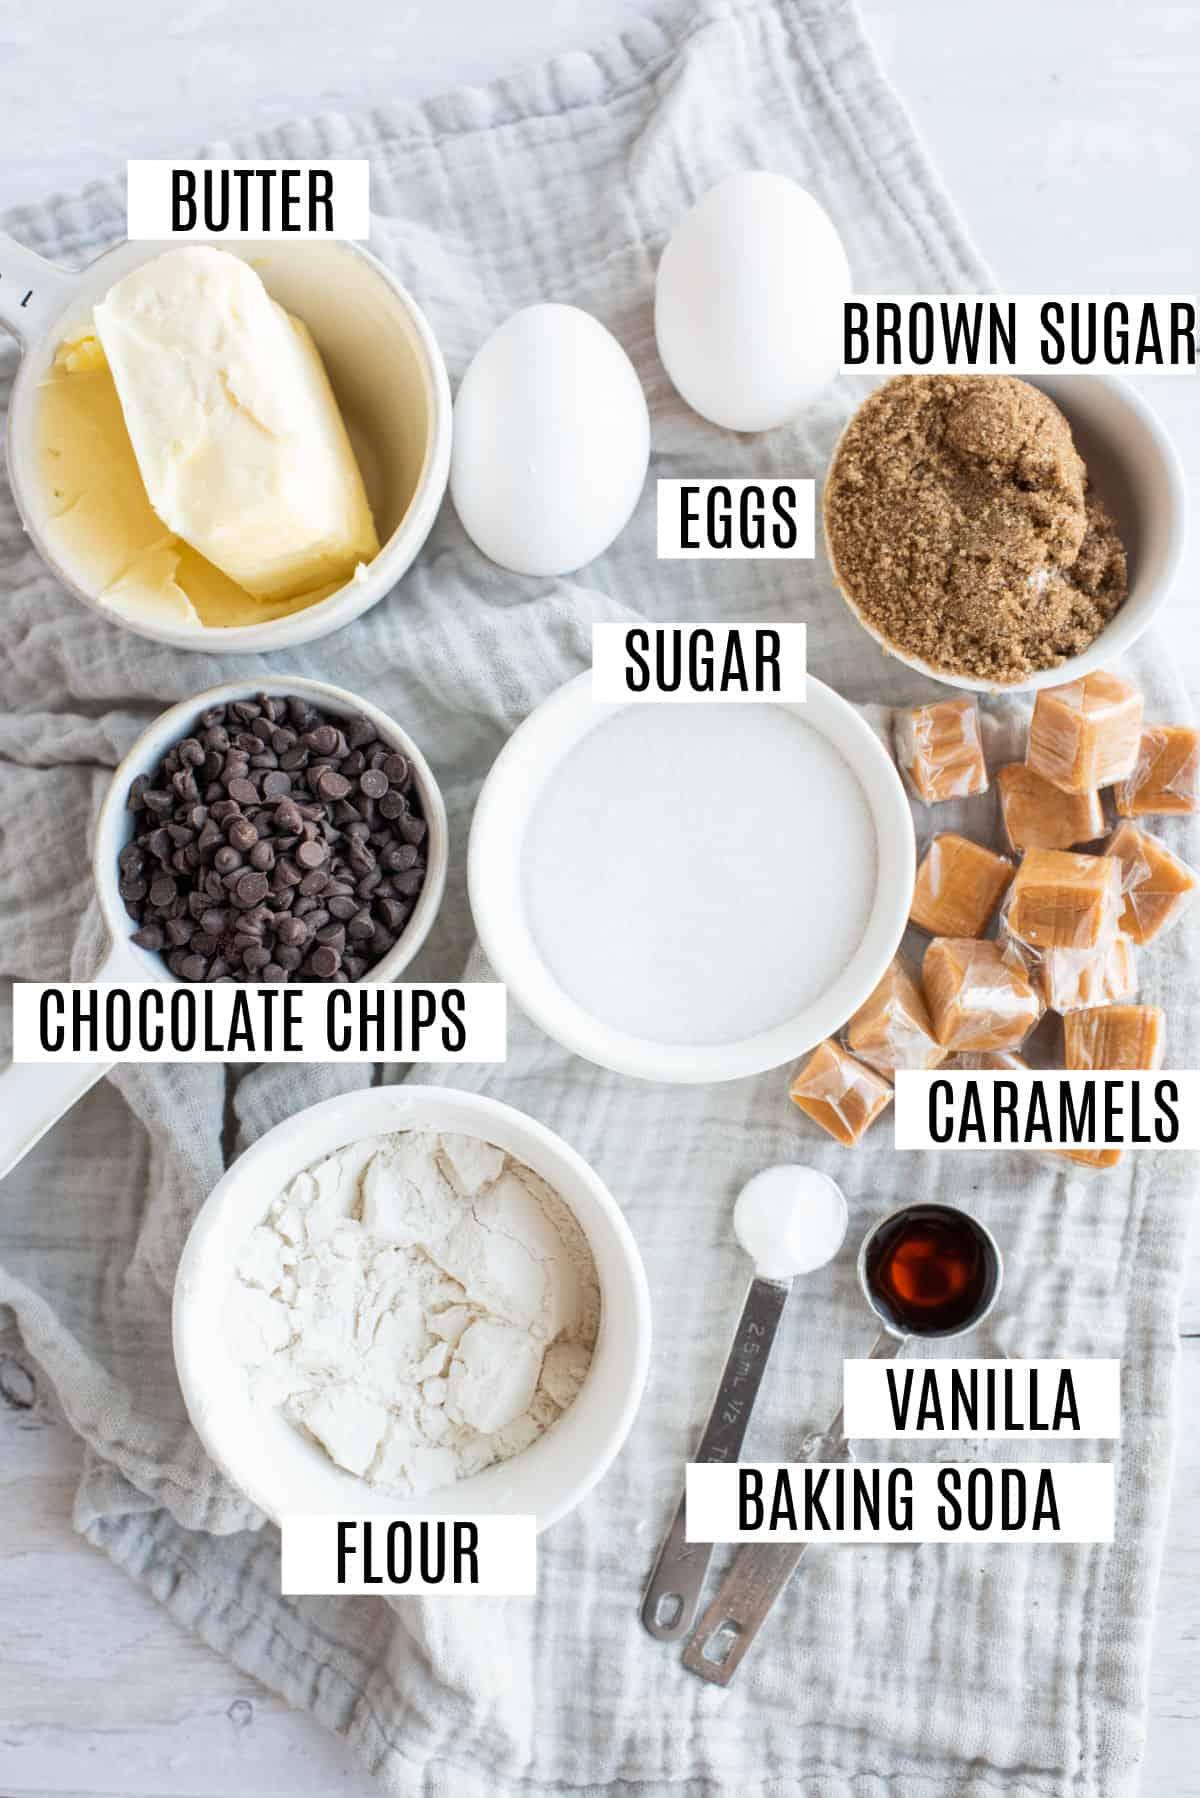 Ingredients needed to make caramel stuffed chocolate chip cookies.